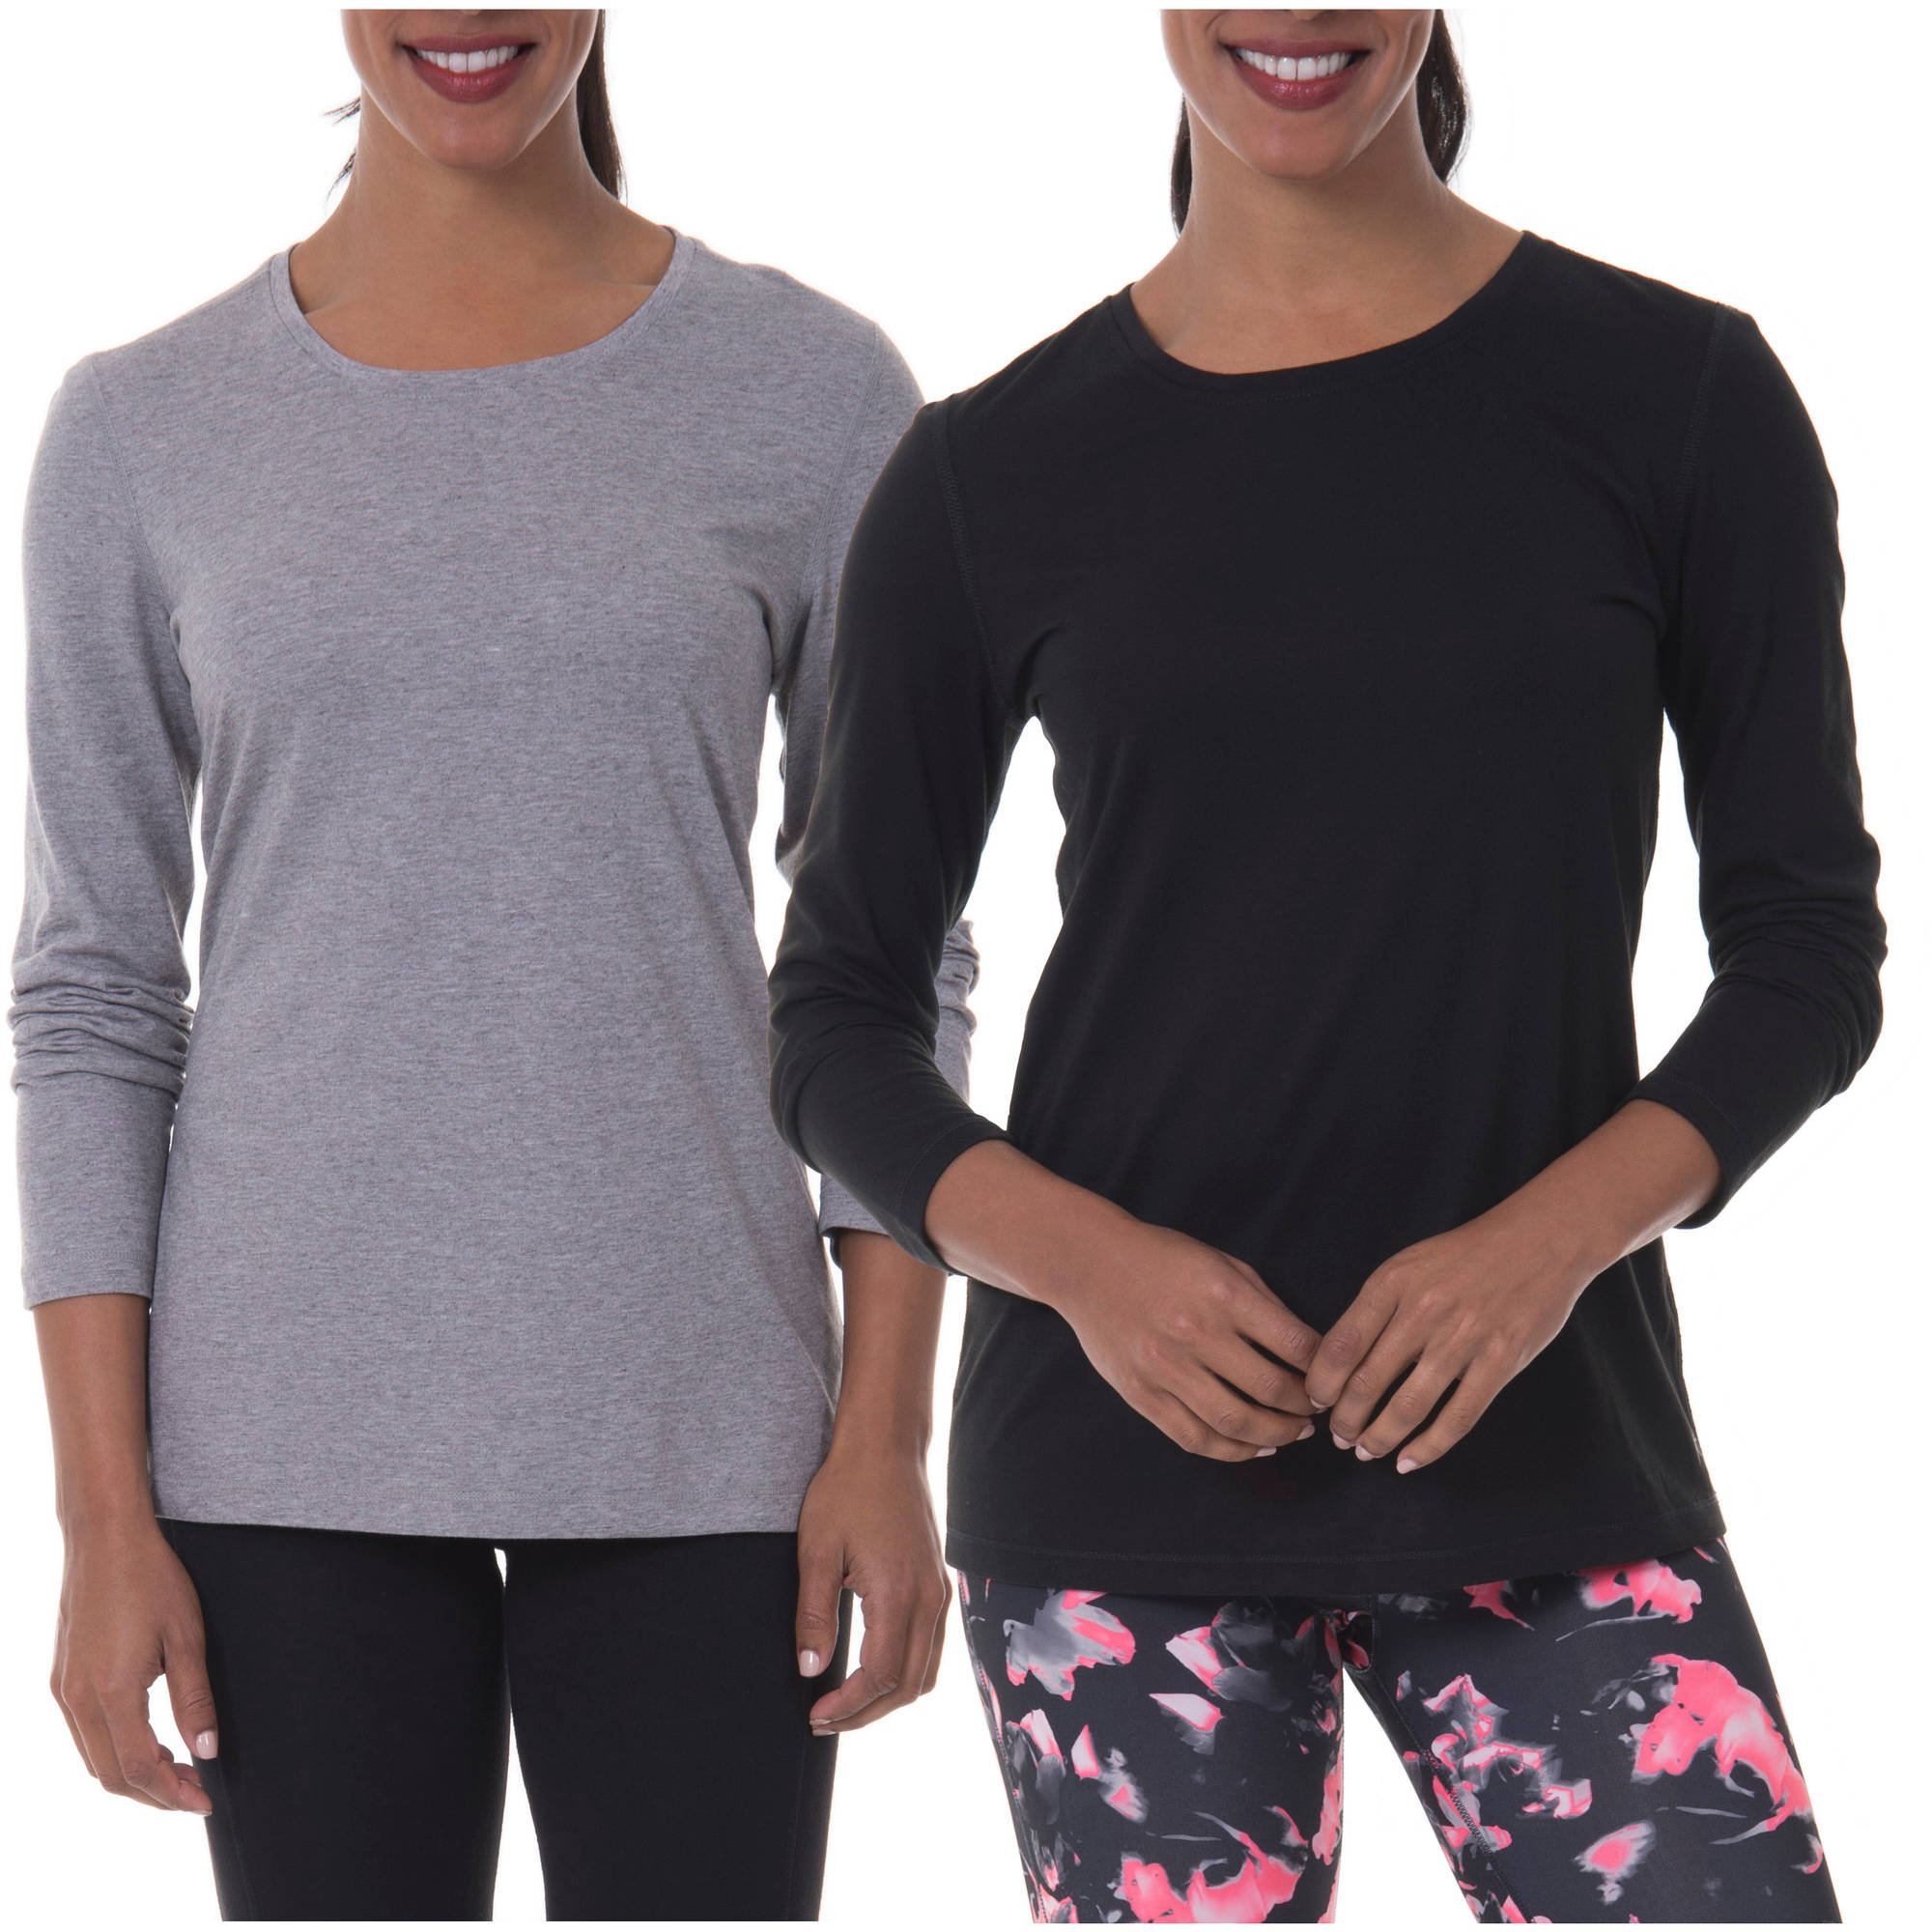 Danskin Now Women's Long-Sleeve Crew Neck Tee 2-Pack Value Bundle